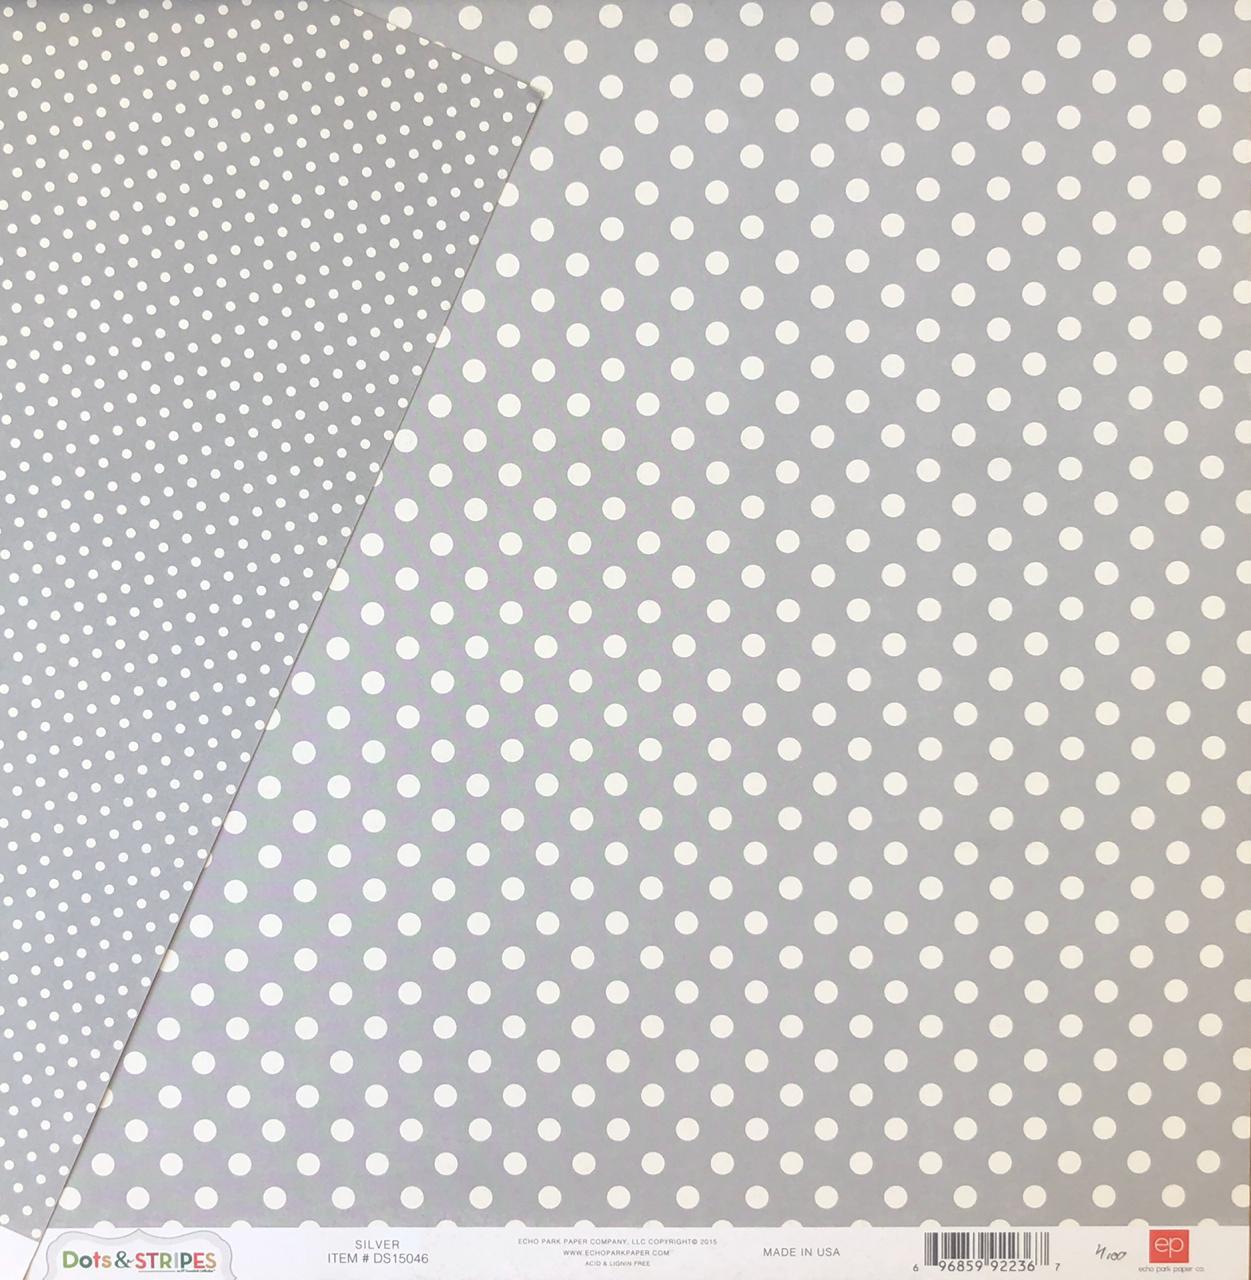 Papel Scrap - Dots & Stripes - Silver (Cinza com Branco) - Echo Park (DS15046)